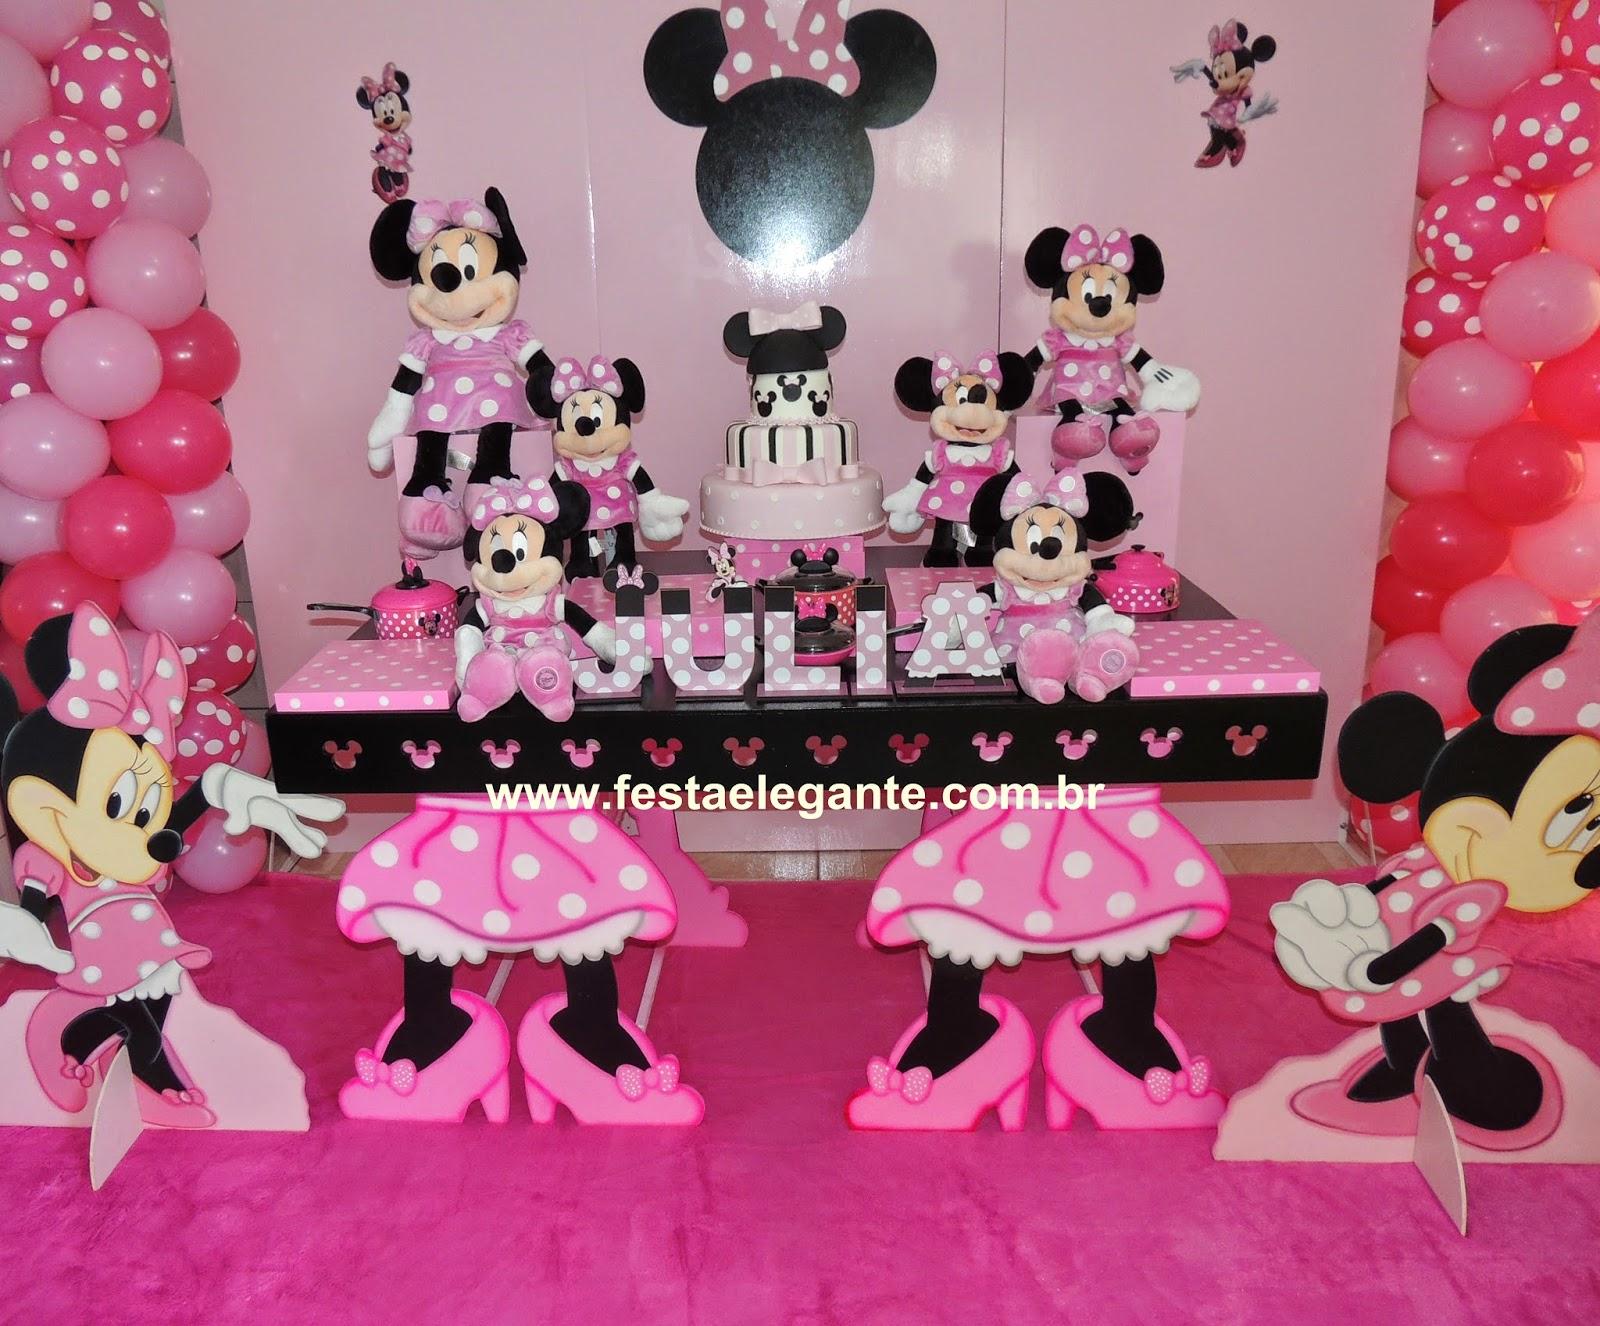 decoracao festa minnie rosa : decoracao festa minnie rosa: minnie rosa, festa minnie rosa, minnie rosa, personalizado minnie rosa